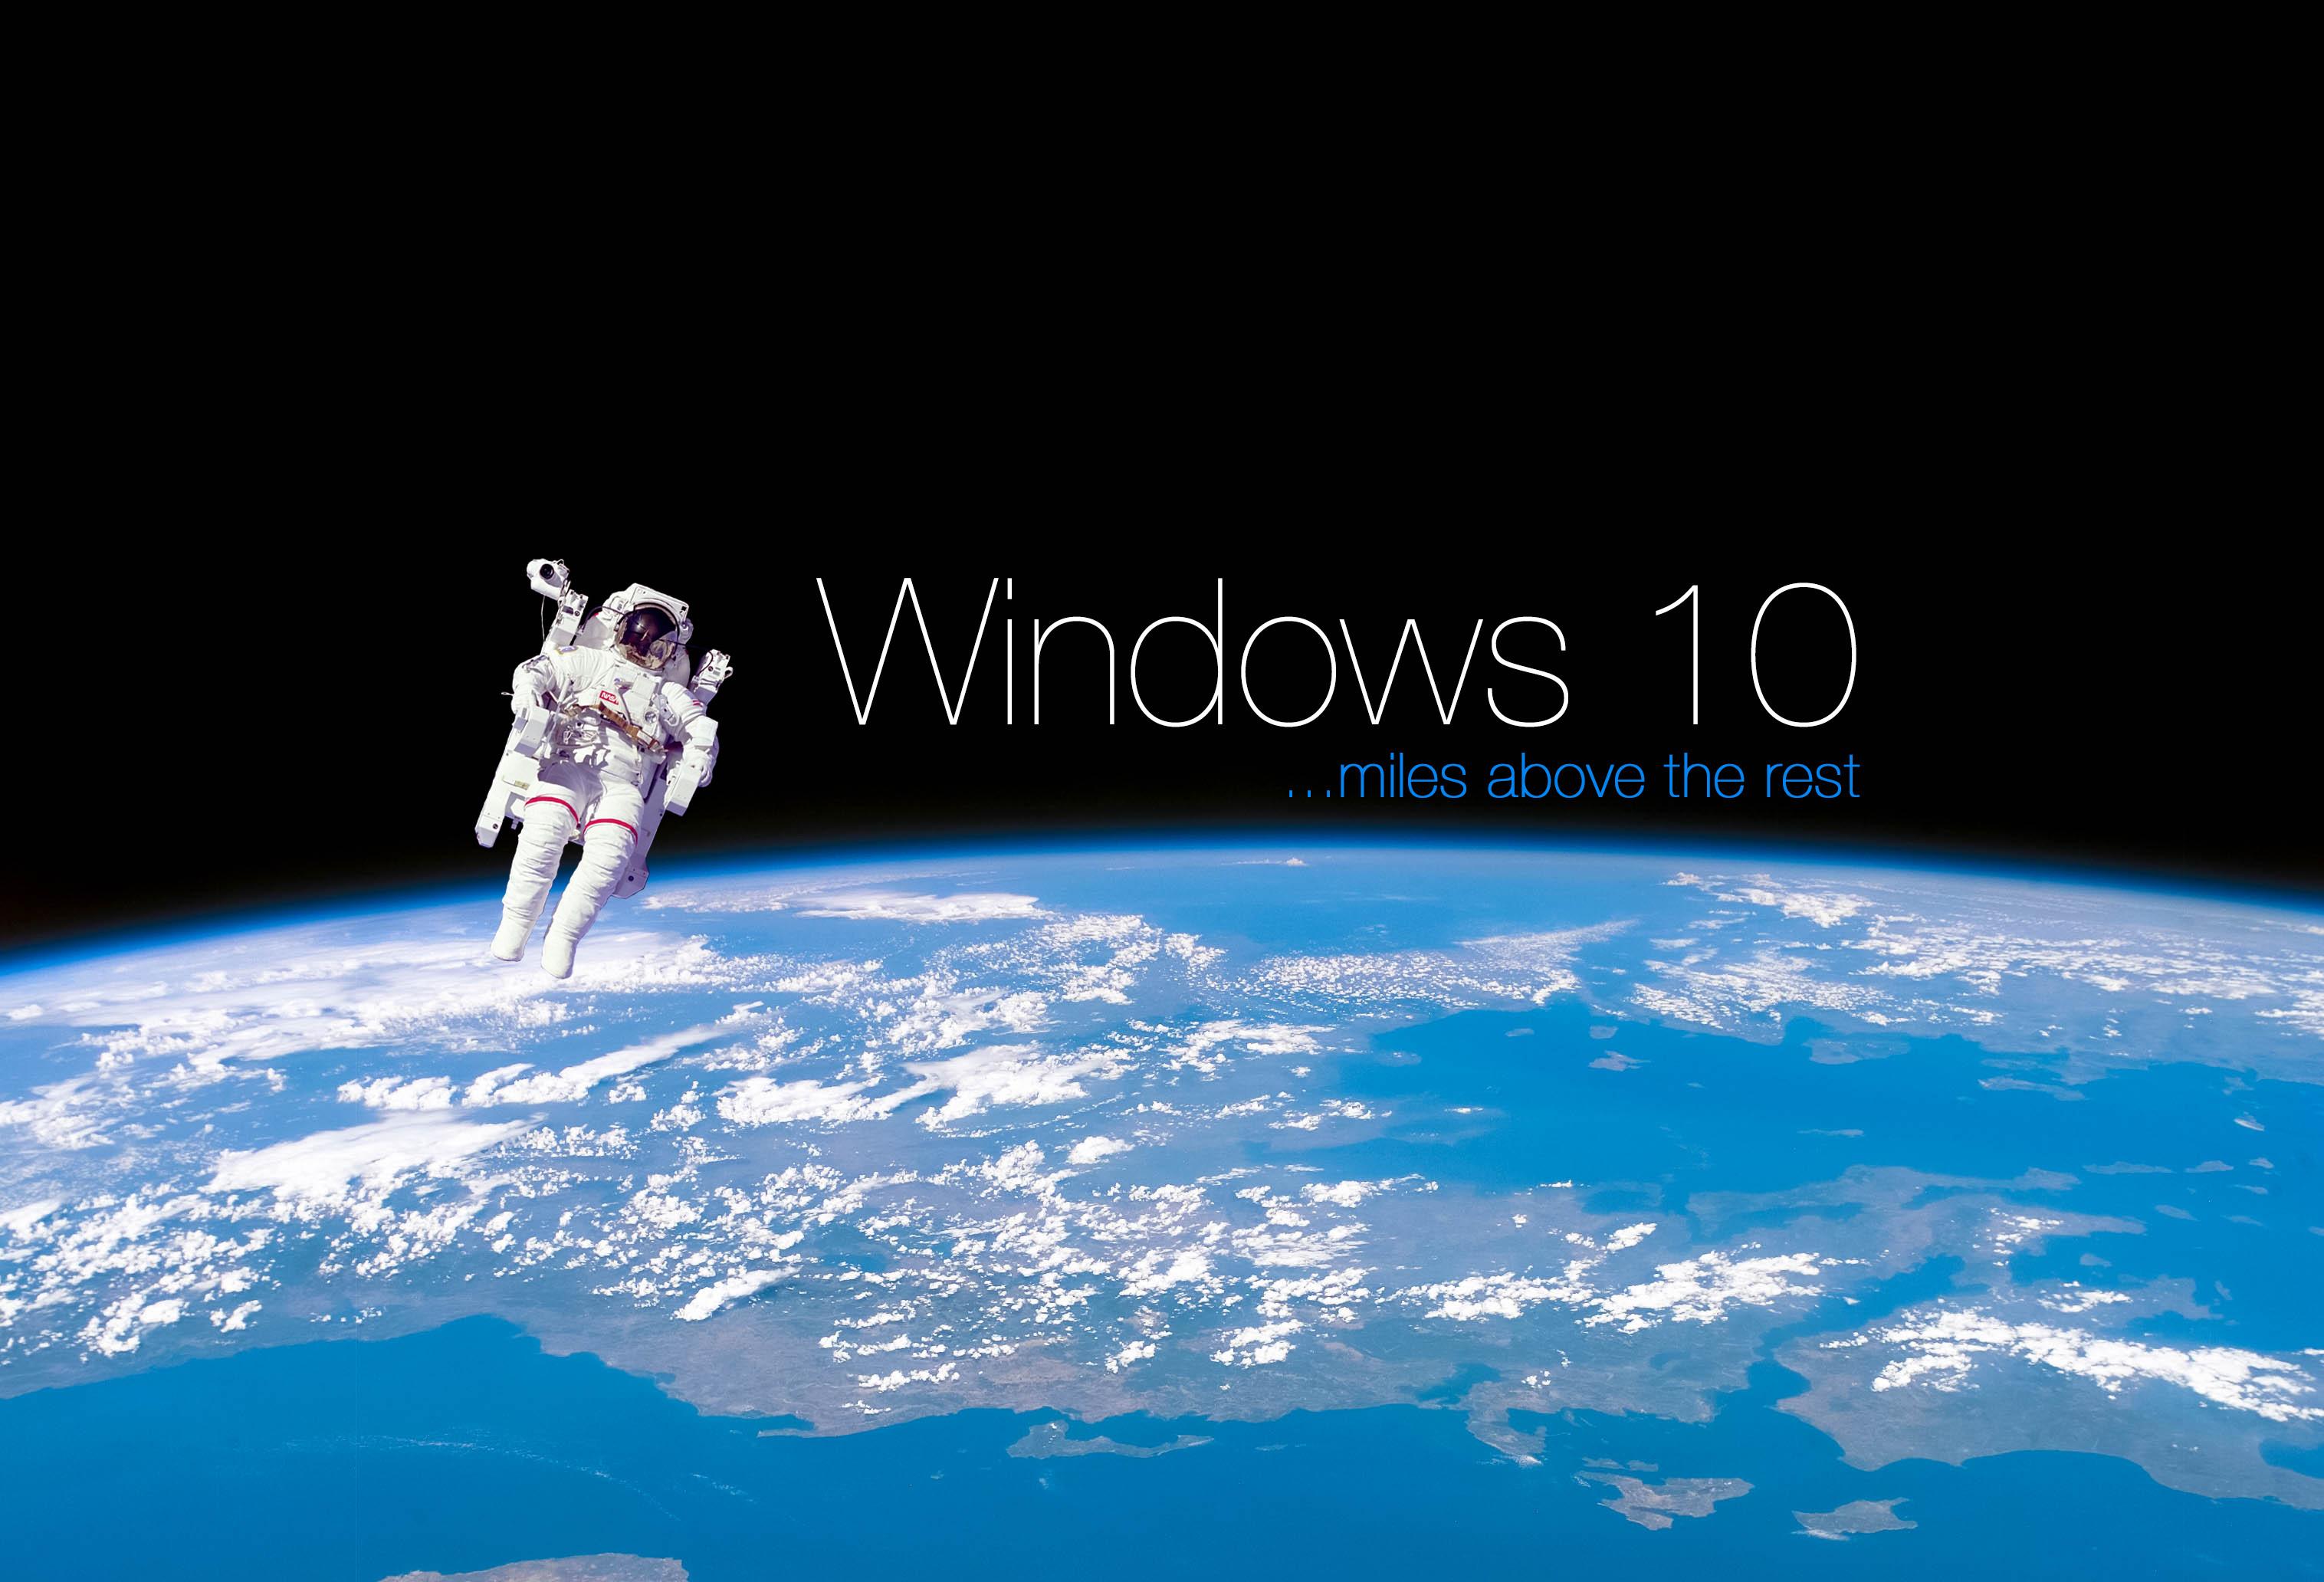 windows 10 wallpaper hd – News GazeNews Gaze